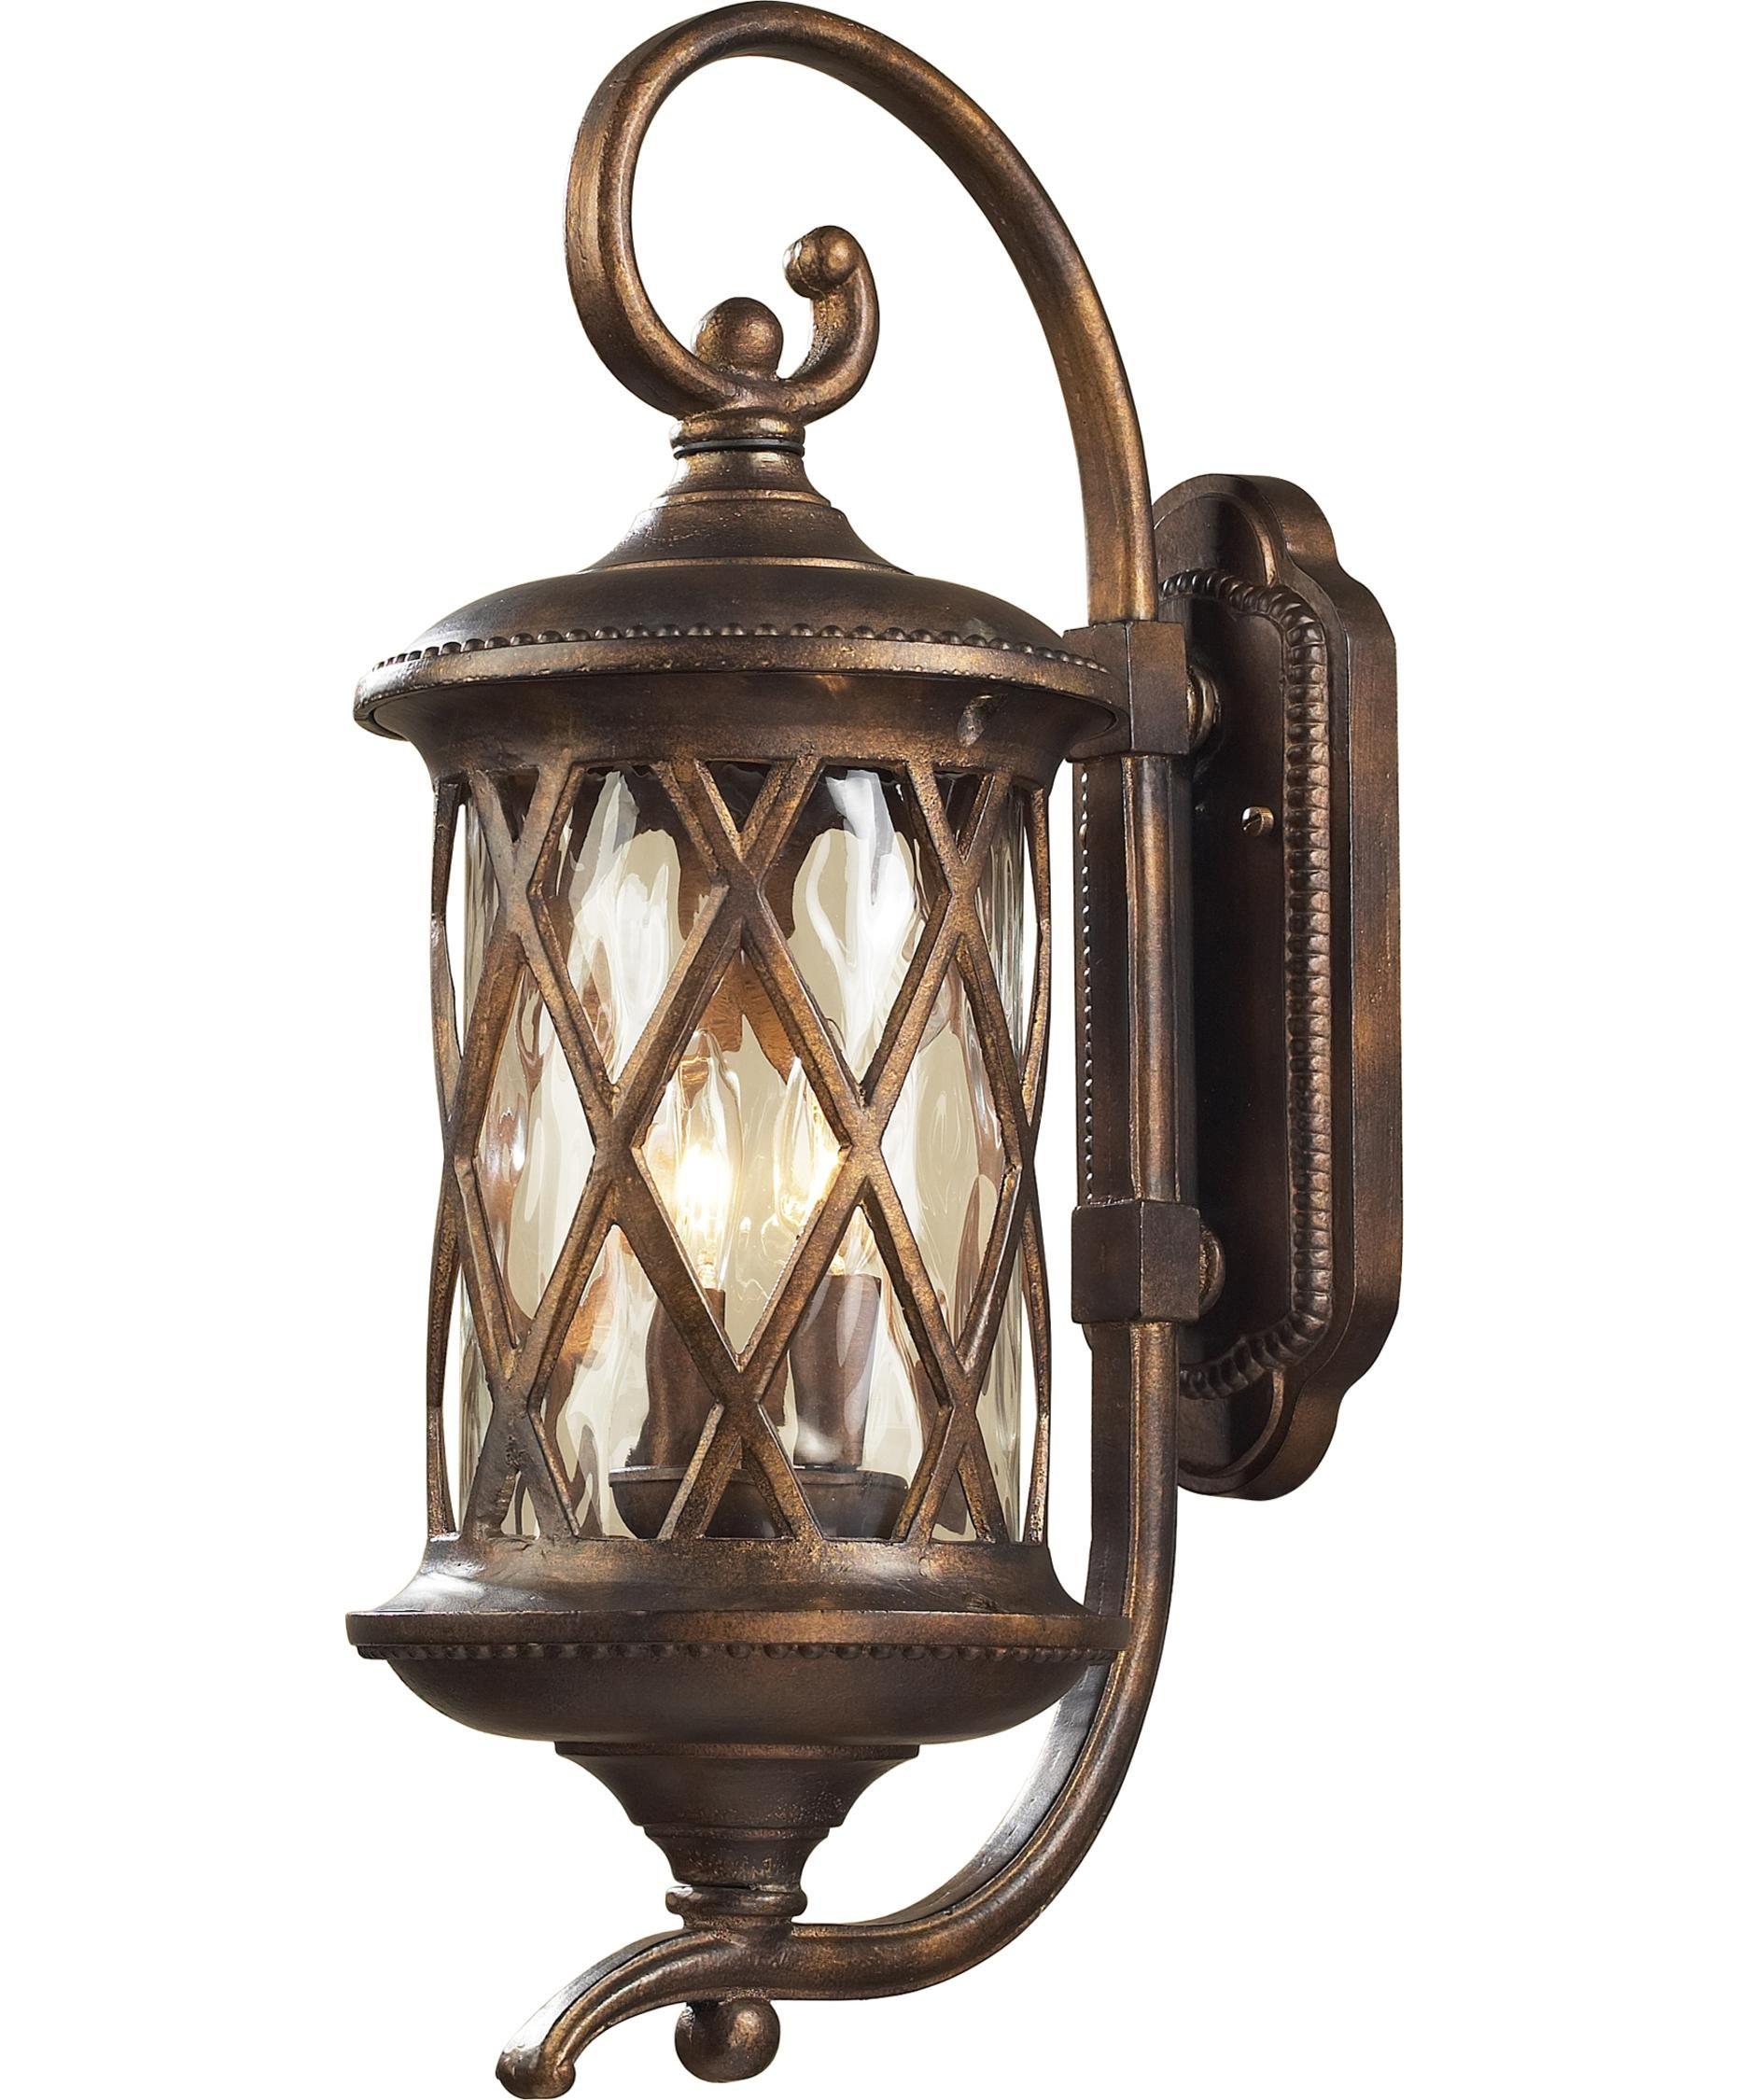 Elk Lighting 42031 2 Barrington Gate Light Outdoor Wall Capitol 1